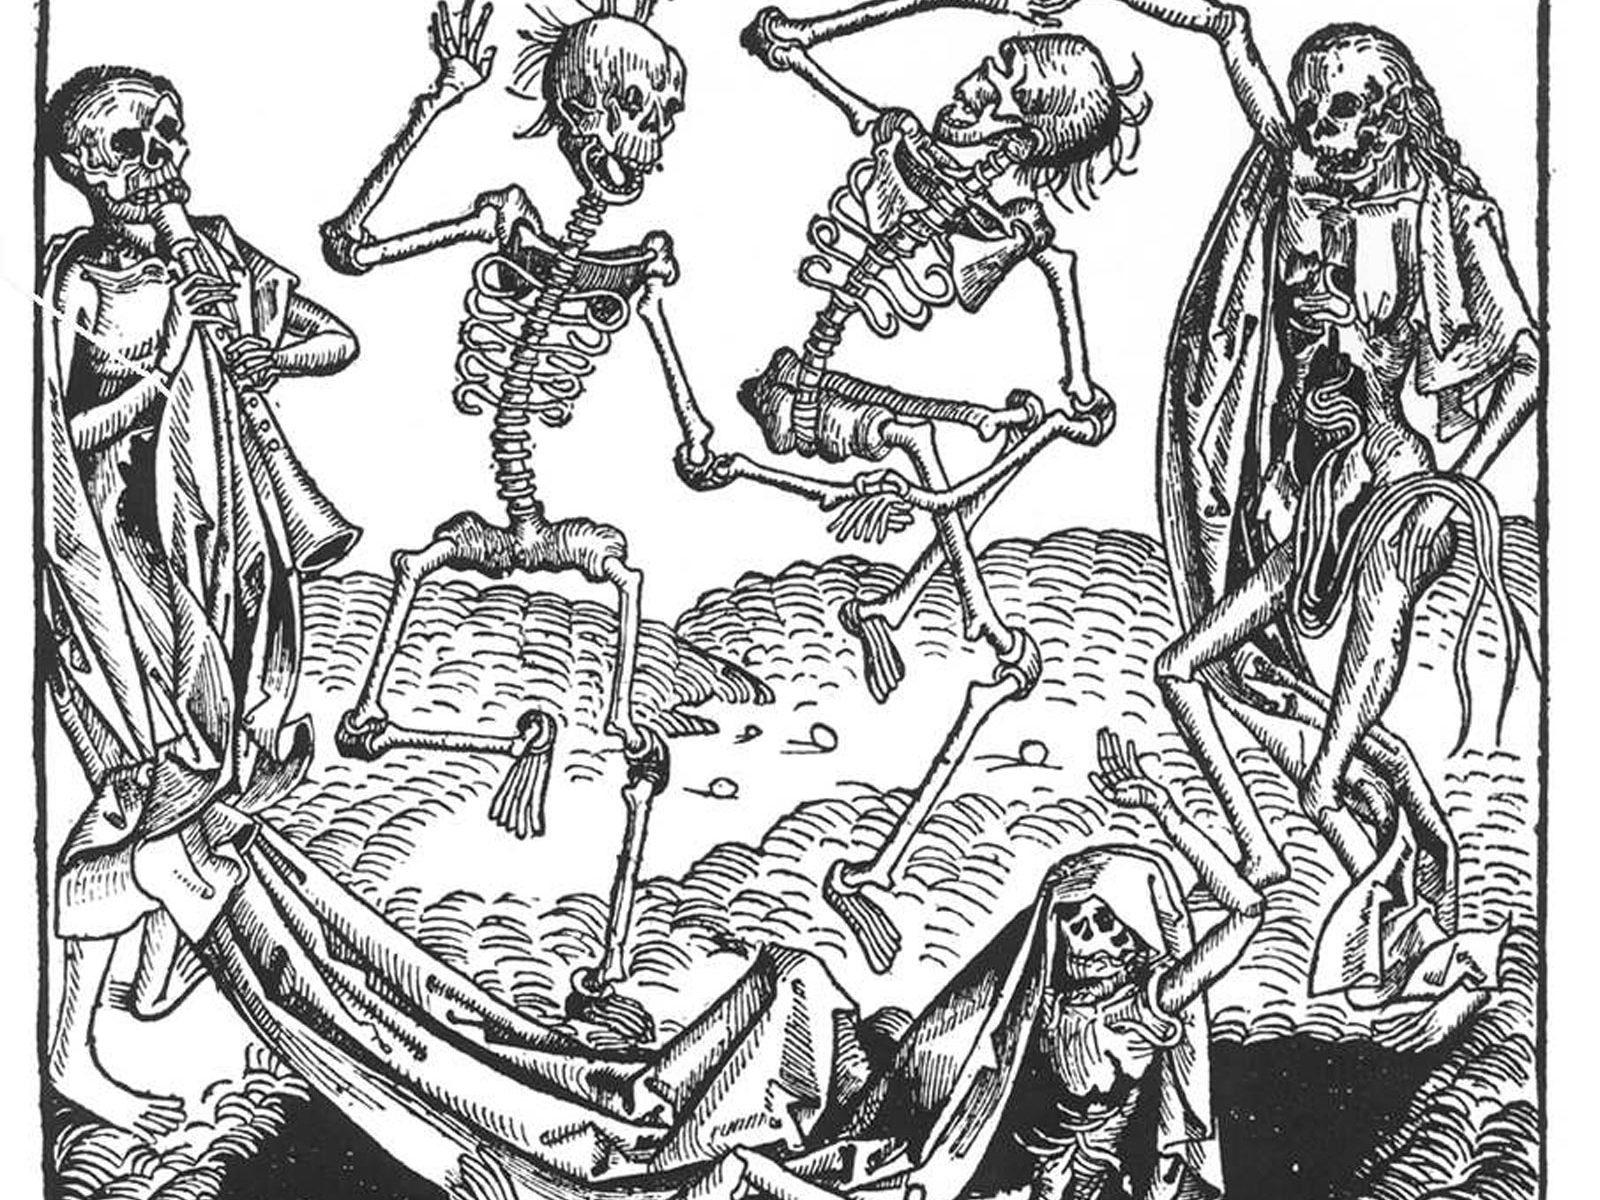 Michael Wolgemut: Tanec smrti